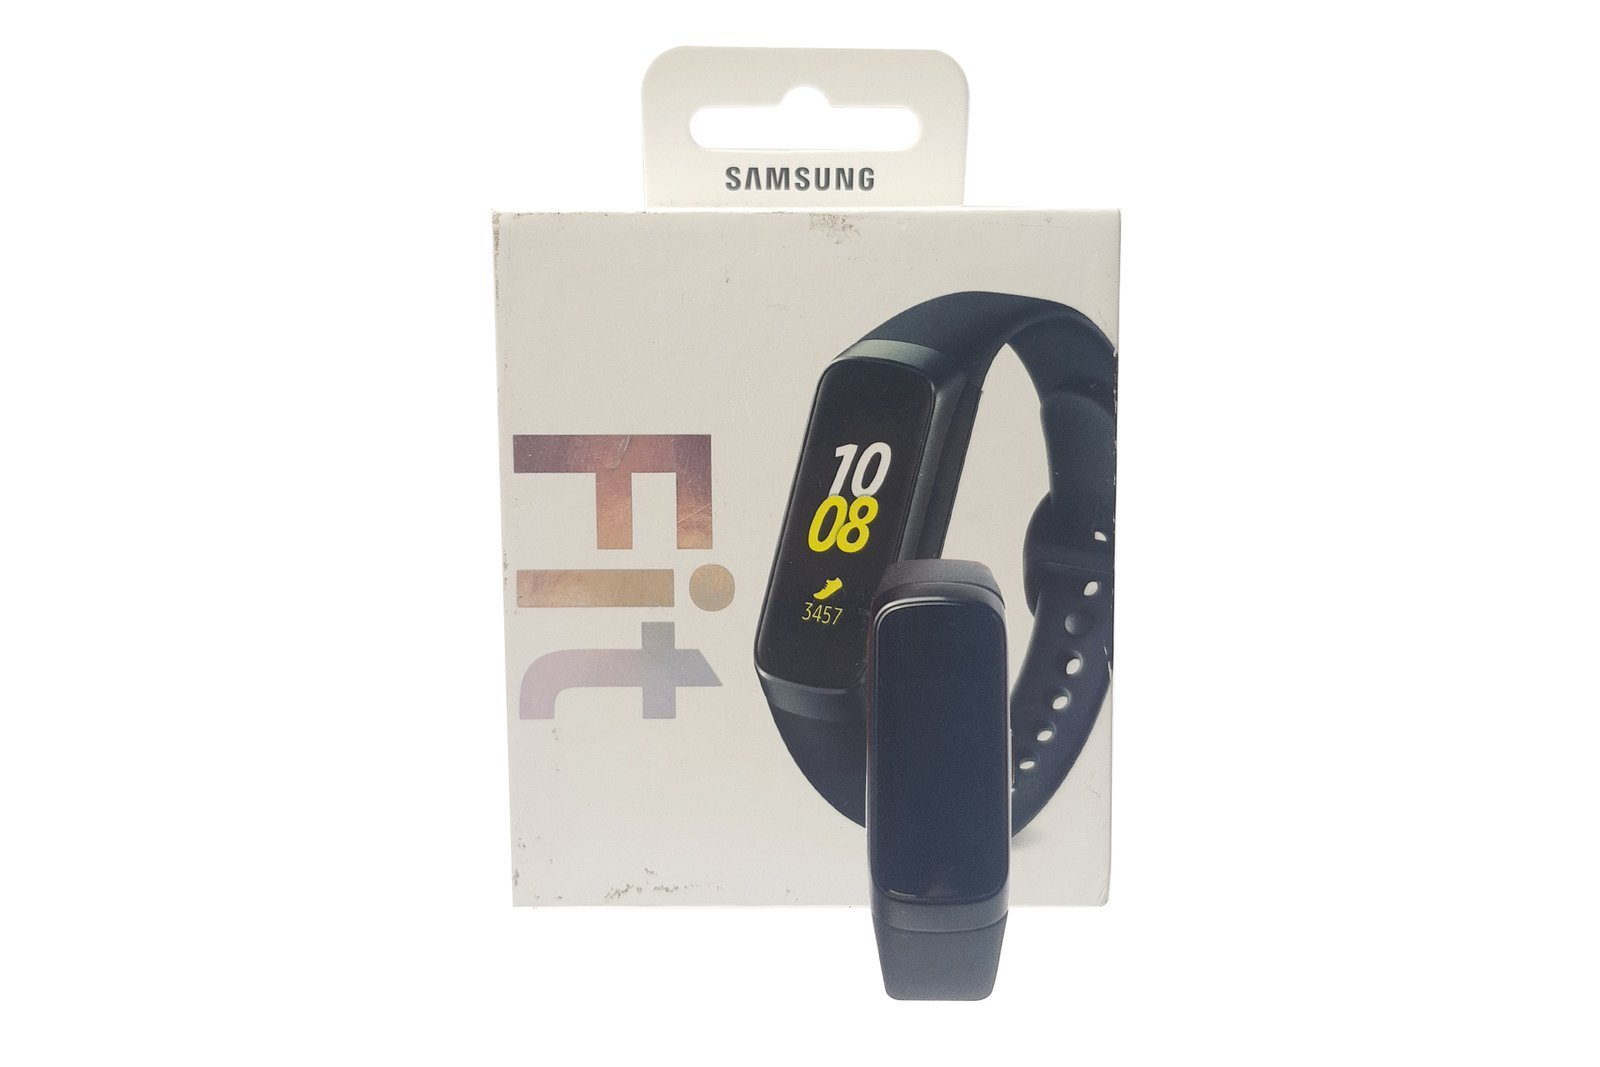 Samsung Galaxy Fit SM-R370 Smart Fitness Watch Smartwatch Black